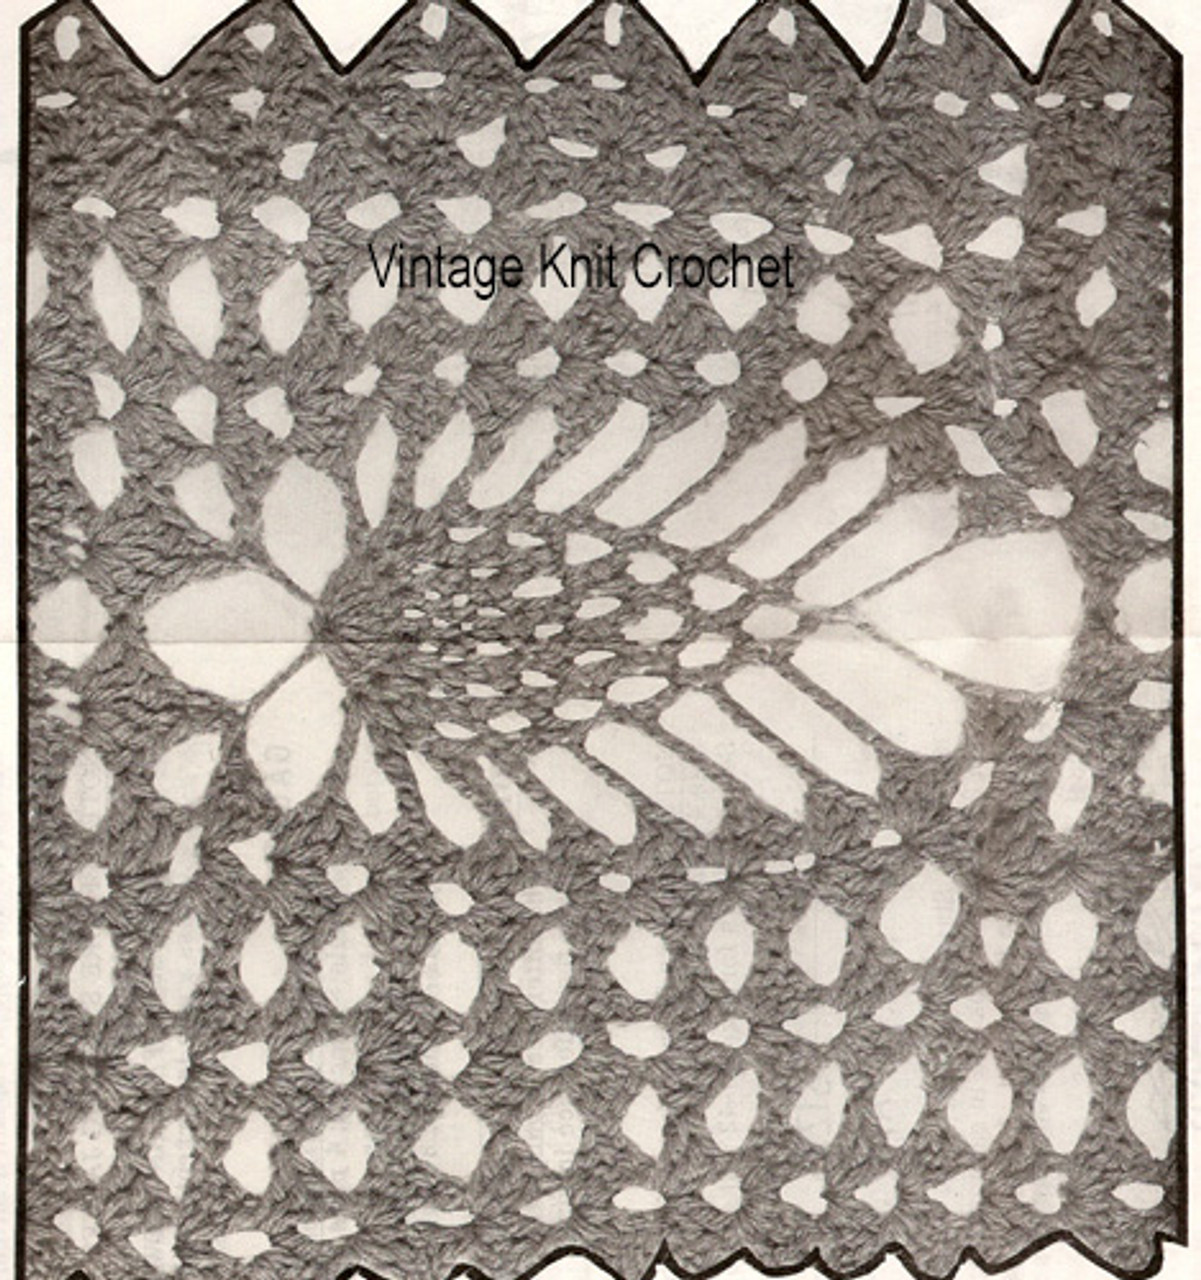 Pineapple Jacket Crochet Motif Illustration